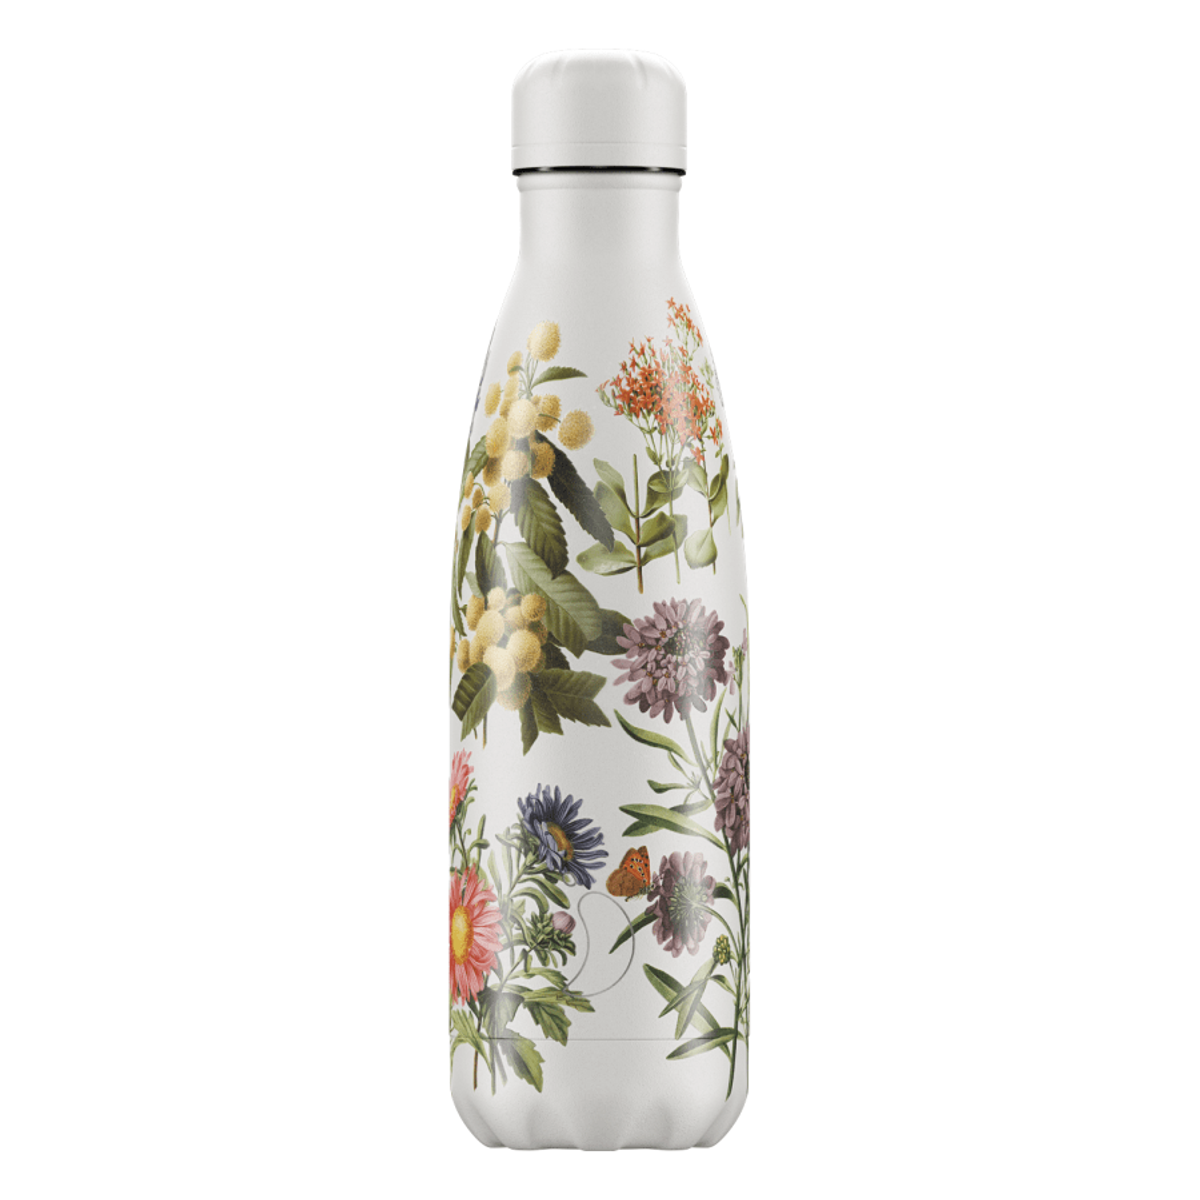 Botanical Flowers Chilly Bottle